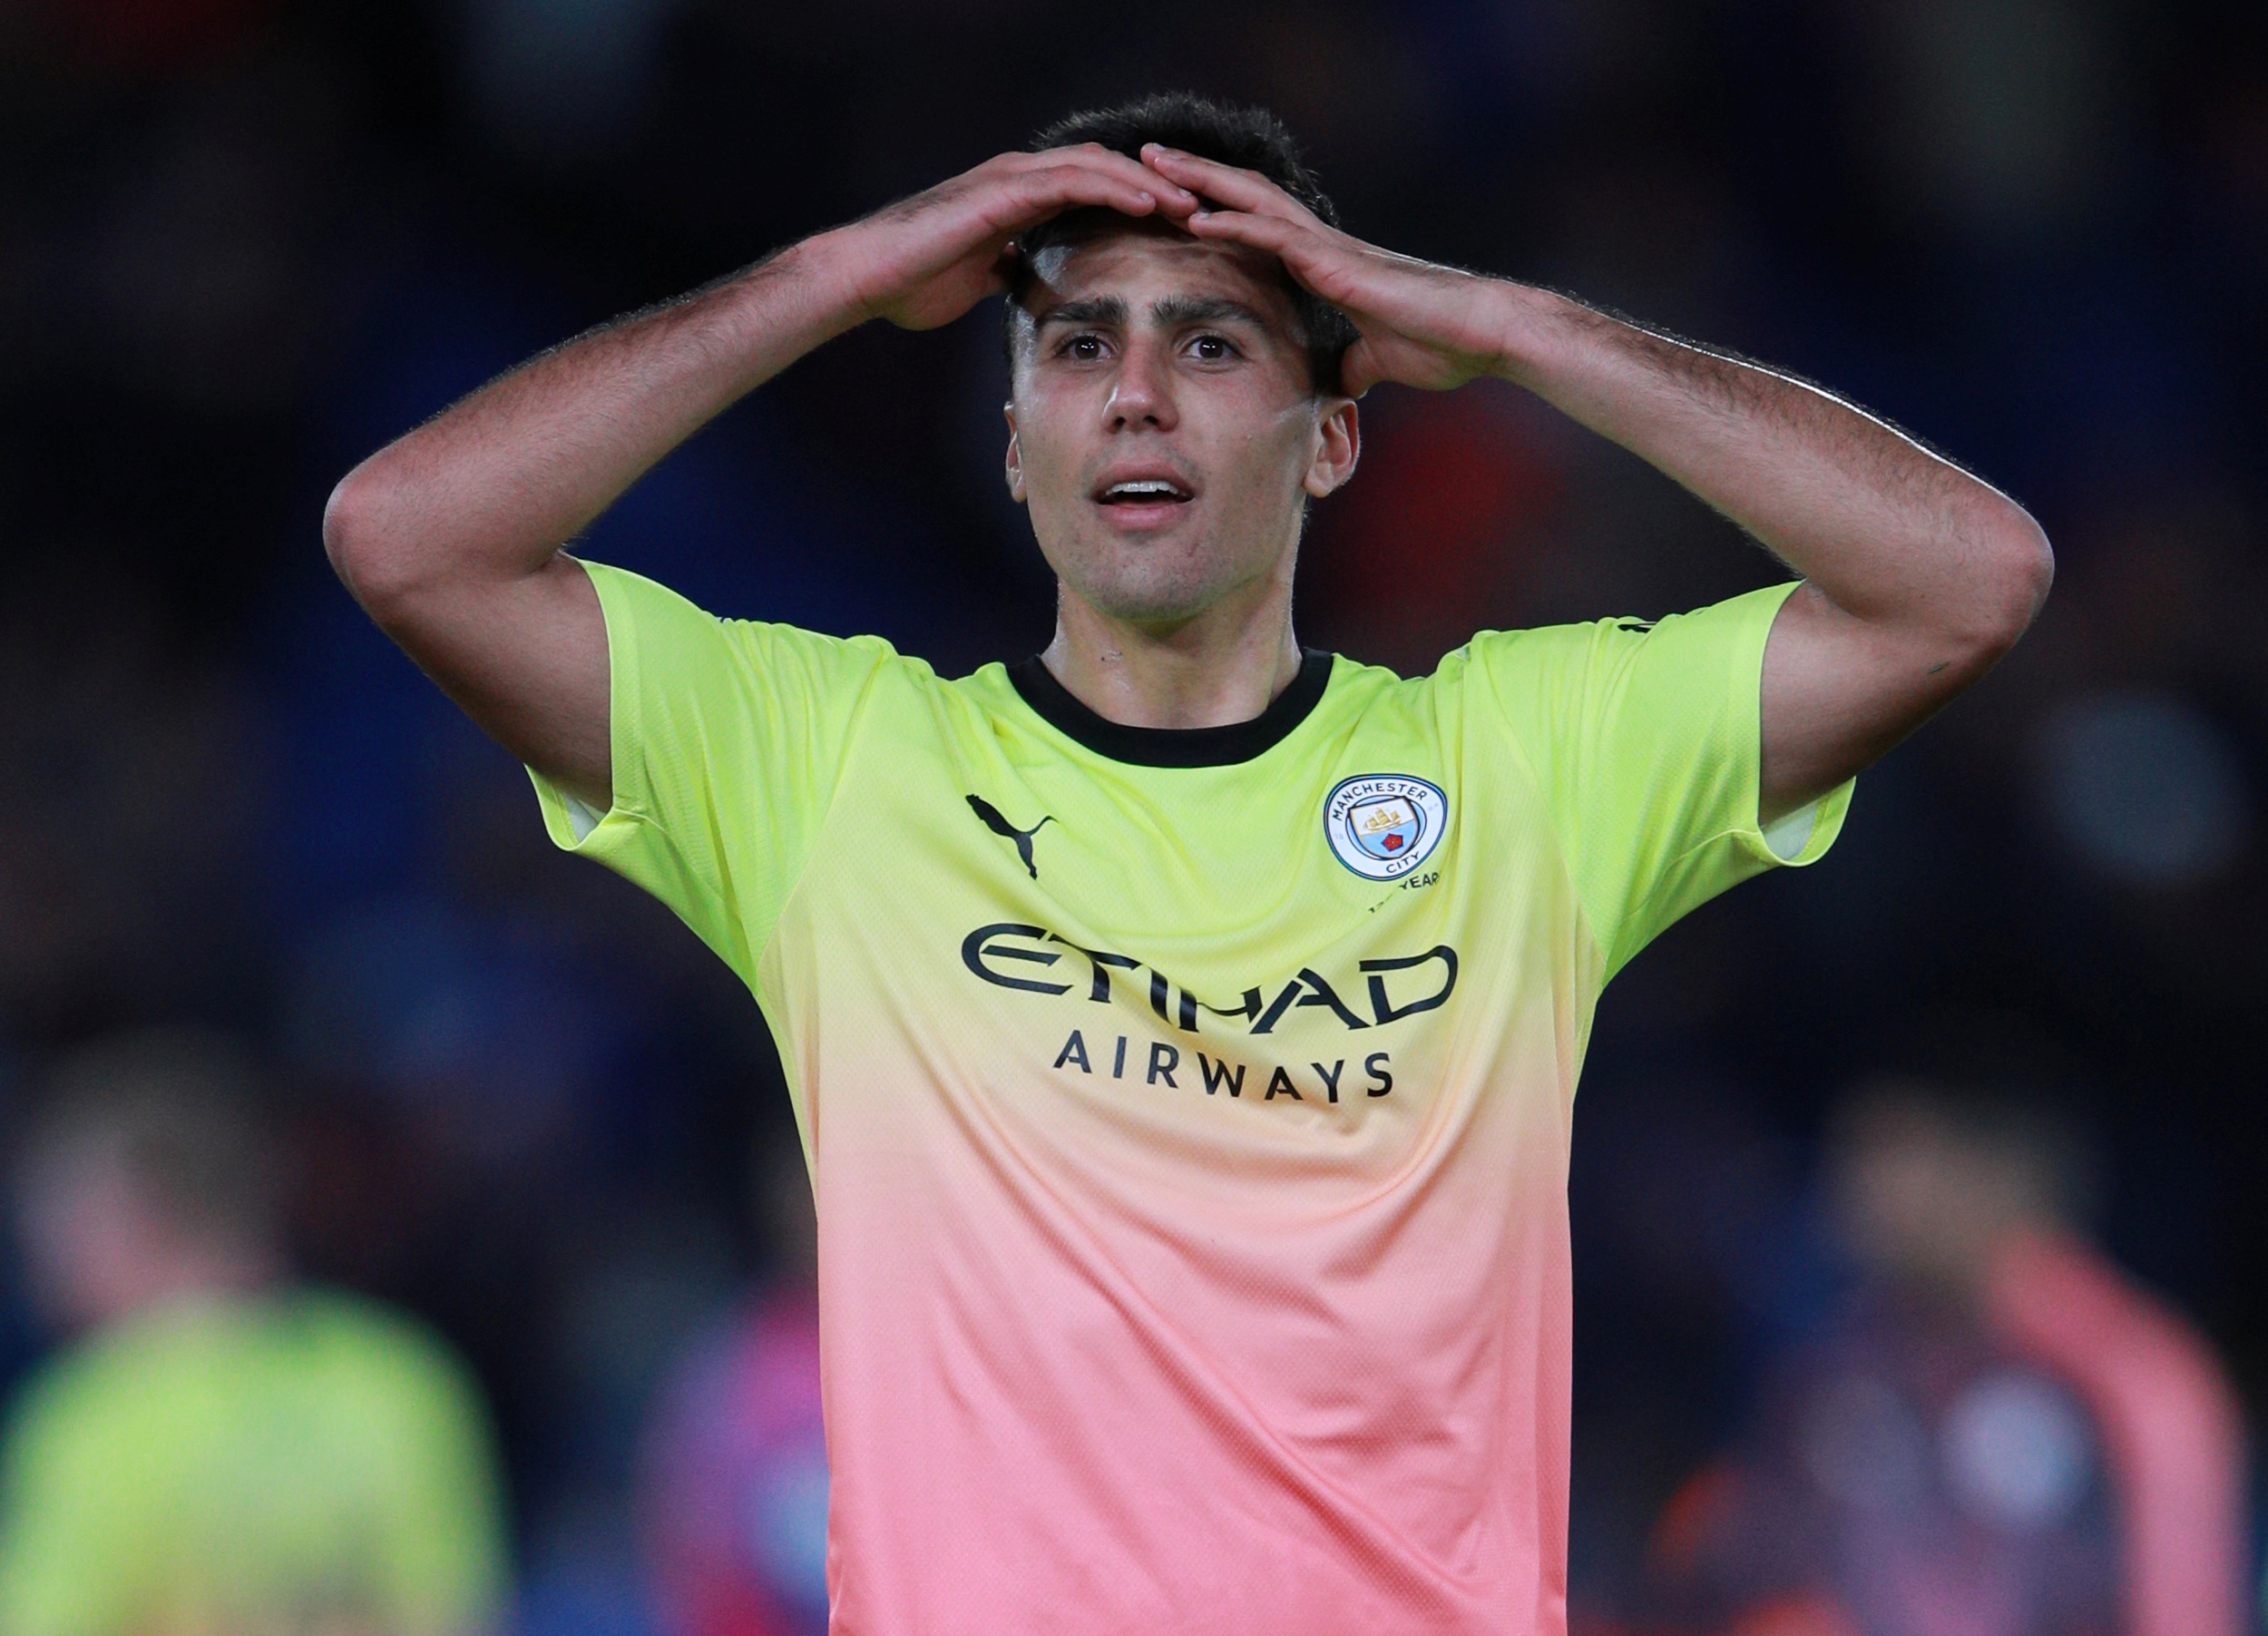 Manchester City lose duo Oleksandr Zinchenko and Rodri to injuries